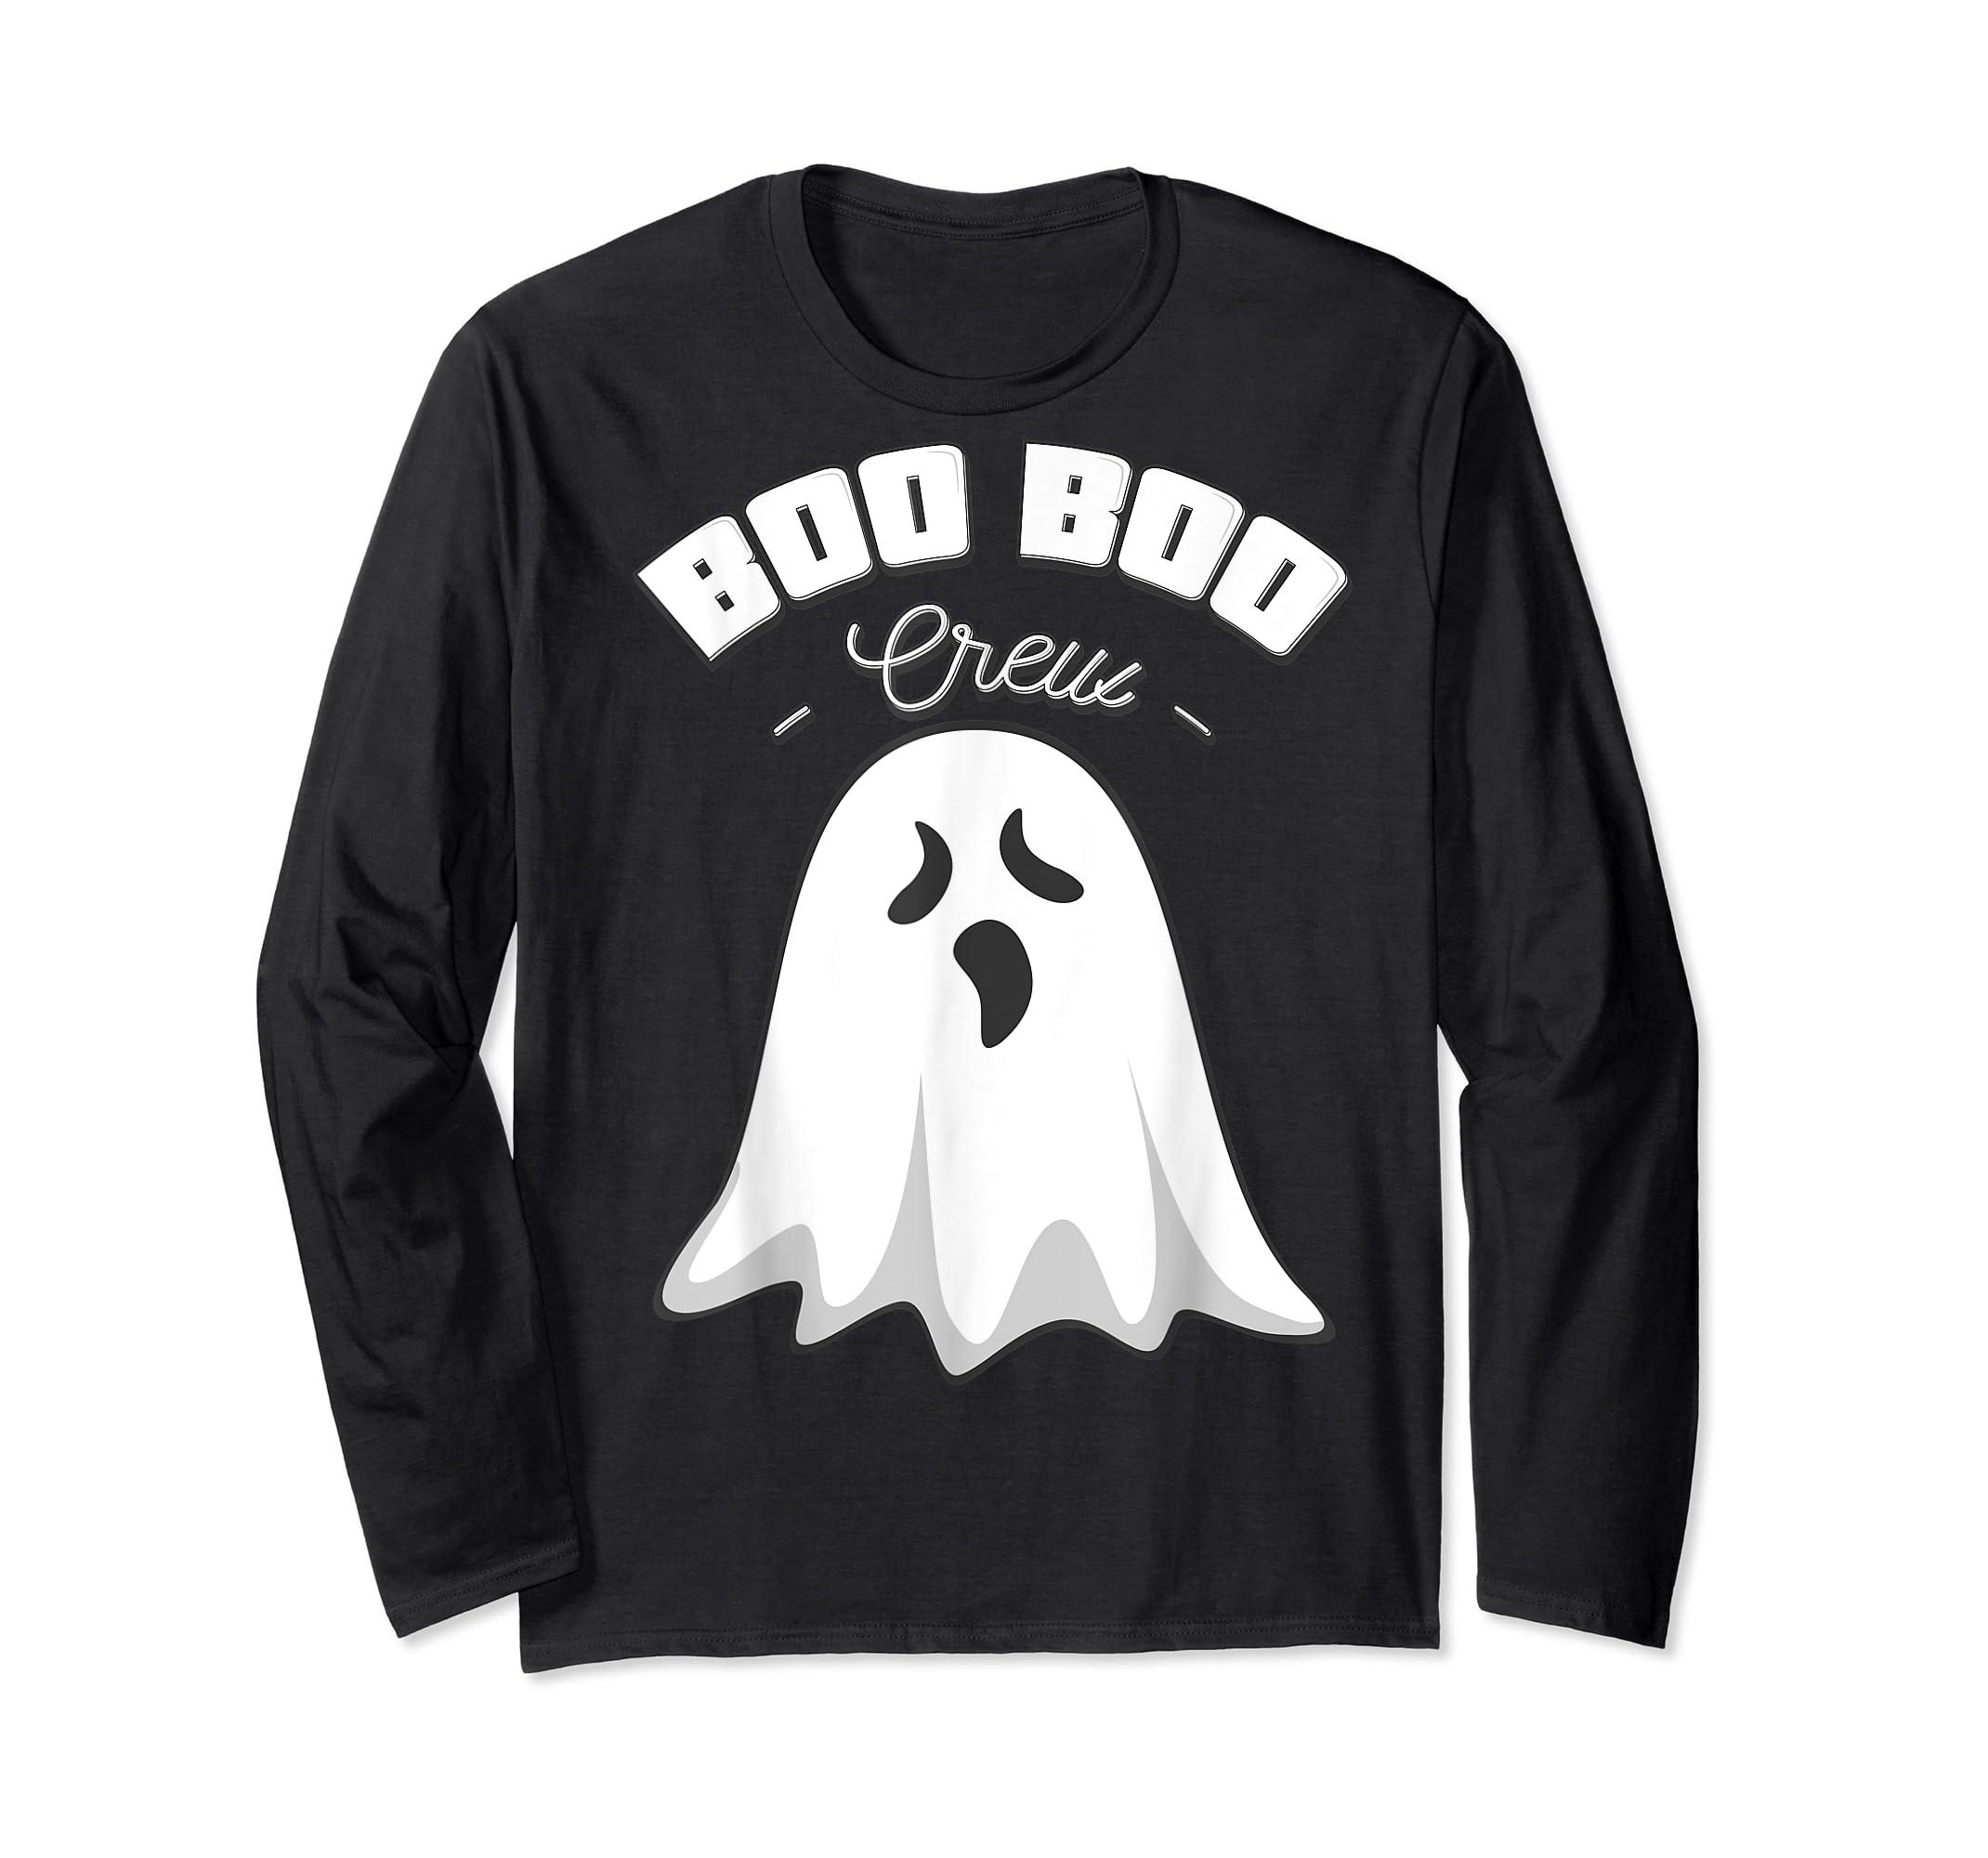 Boo Boo Crew Ghost Funny Halloween Black and Orange Night T-Shirt-Long Sleeve-Black